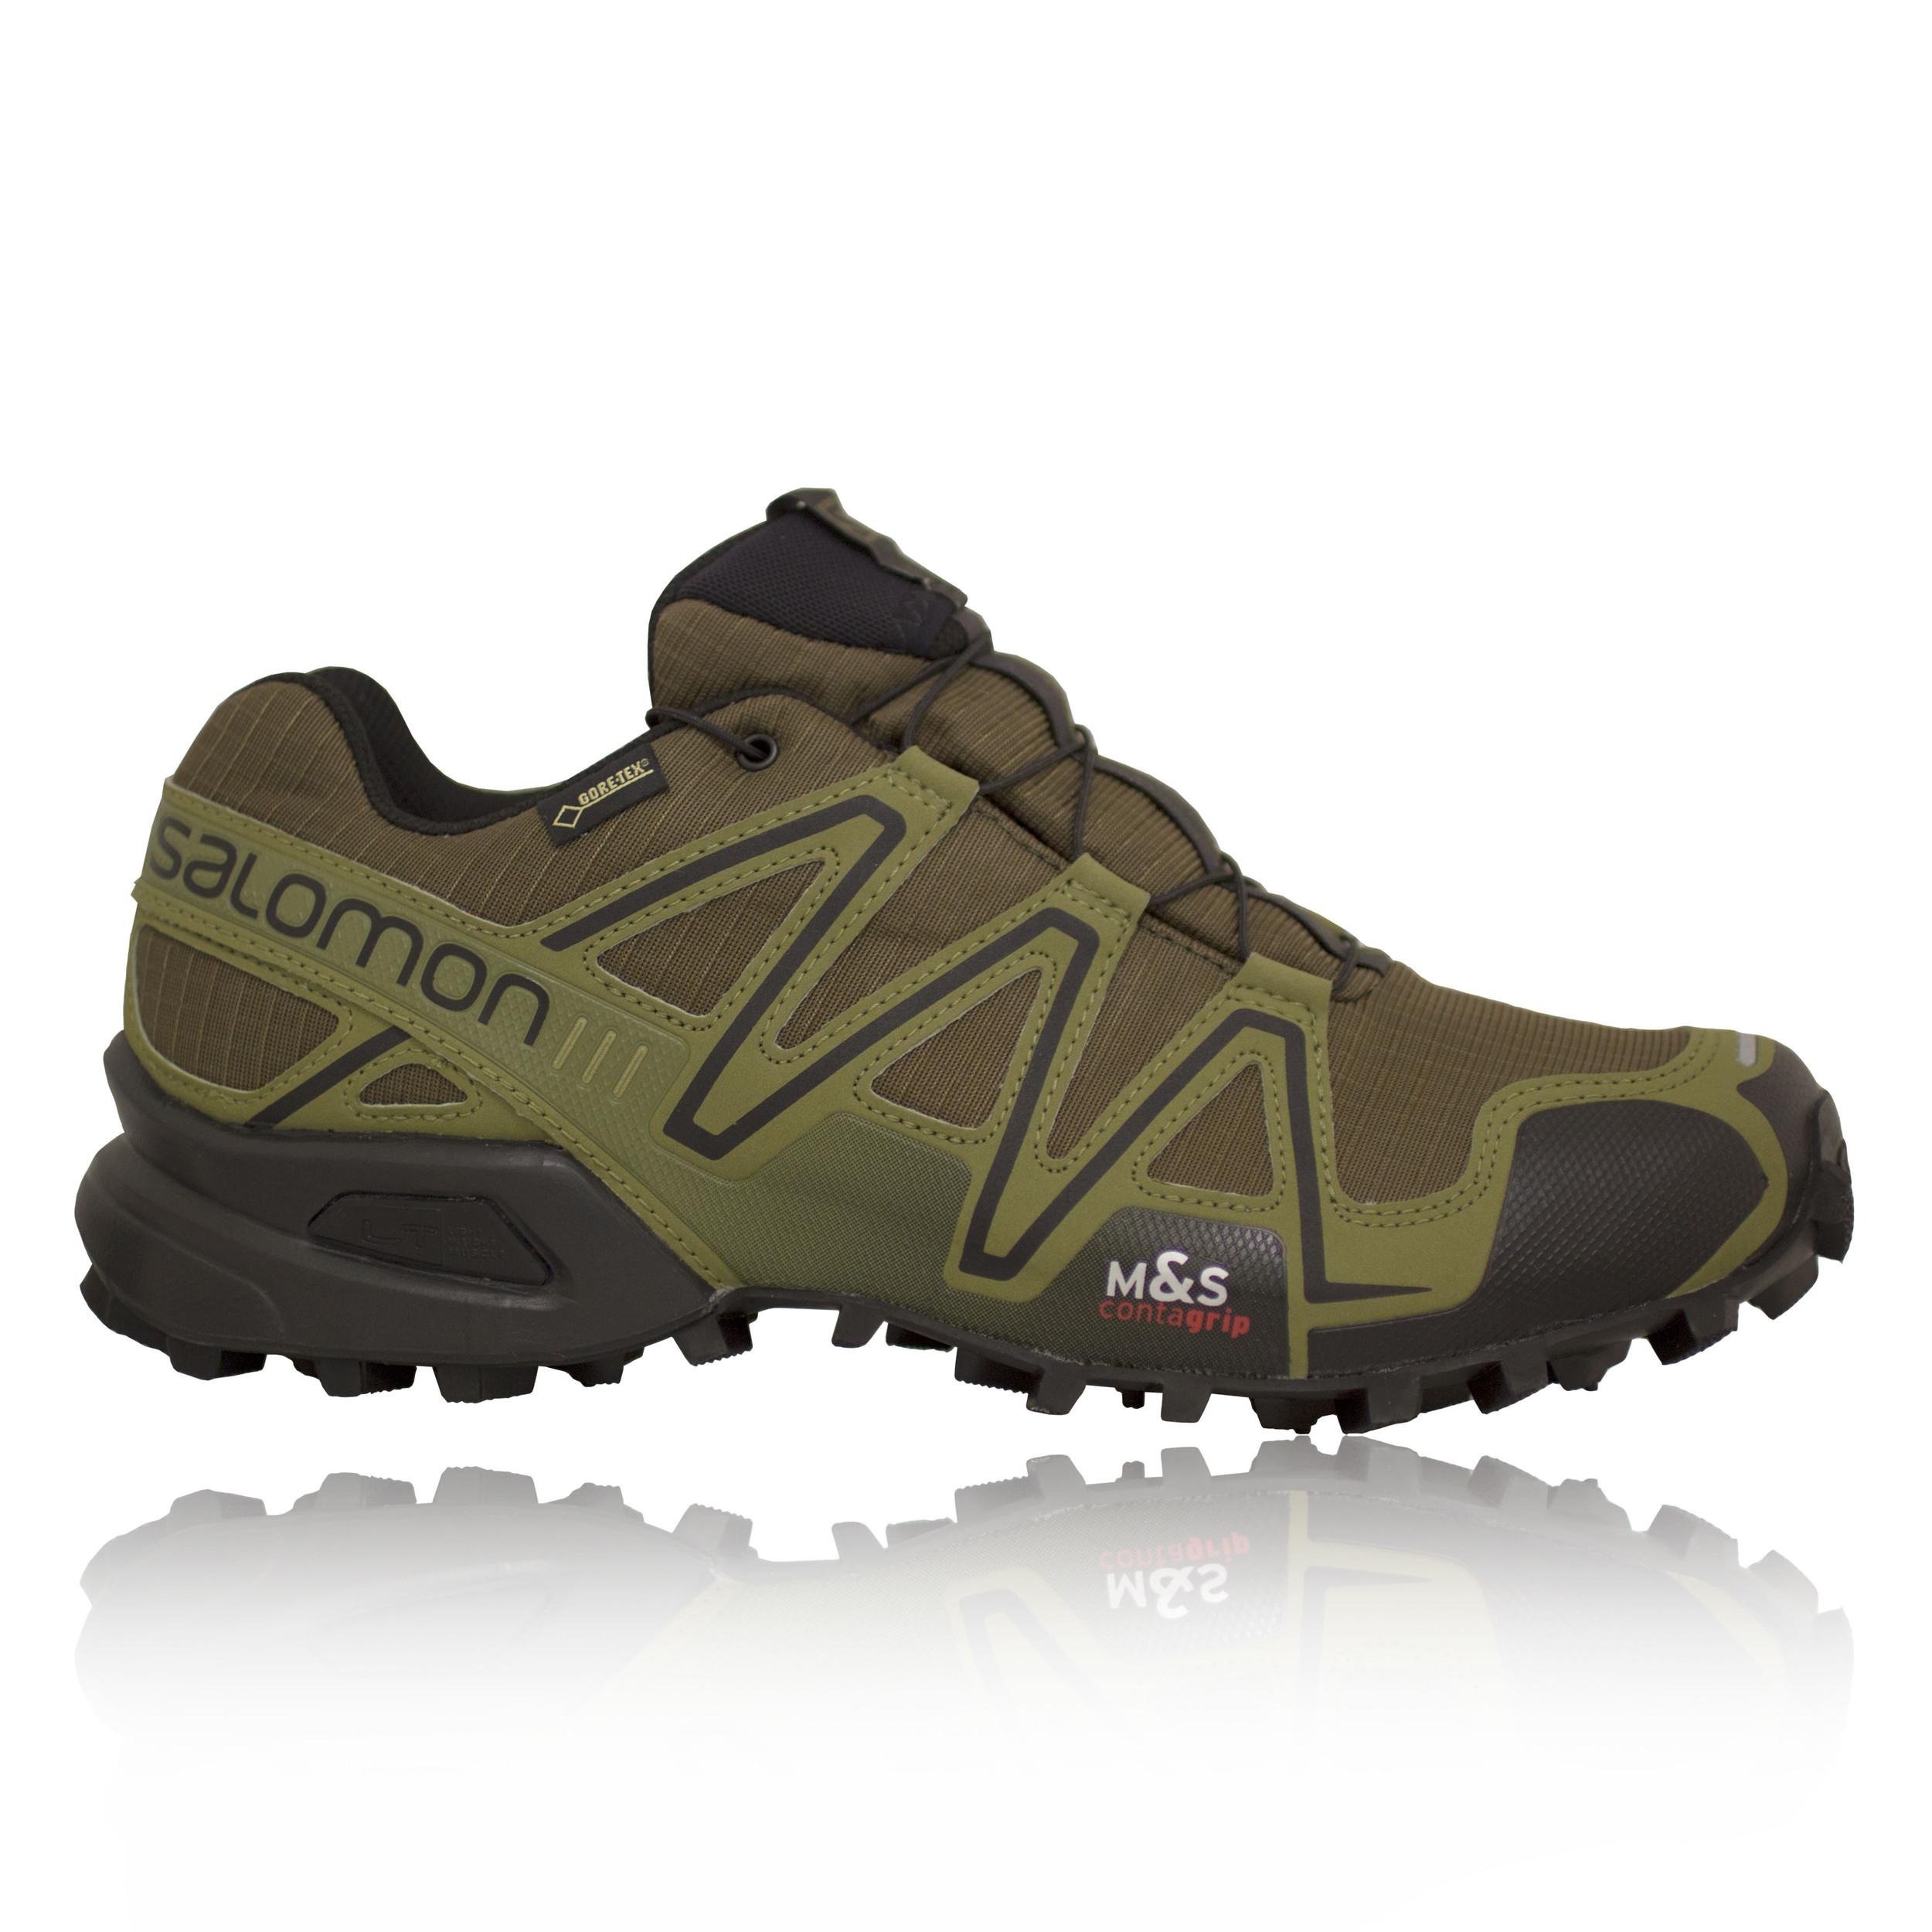 salomon speedcross 3 gtx mens green waterproof training trail running shoes. Black Bedroom Furniture Sets. Home Design Ideas